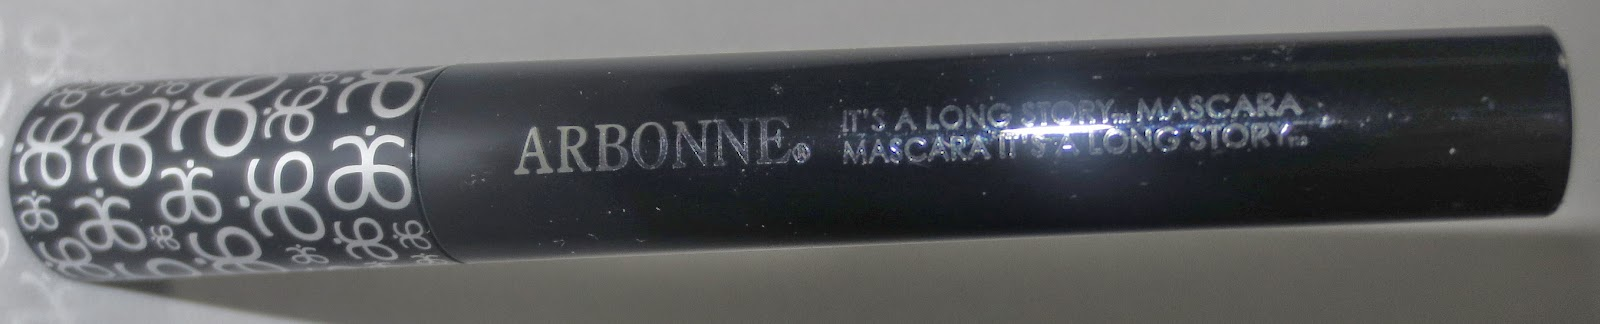 Arbonne It's a Long Story Mascara